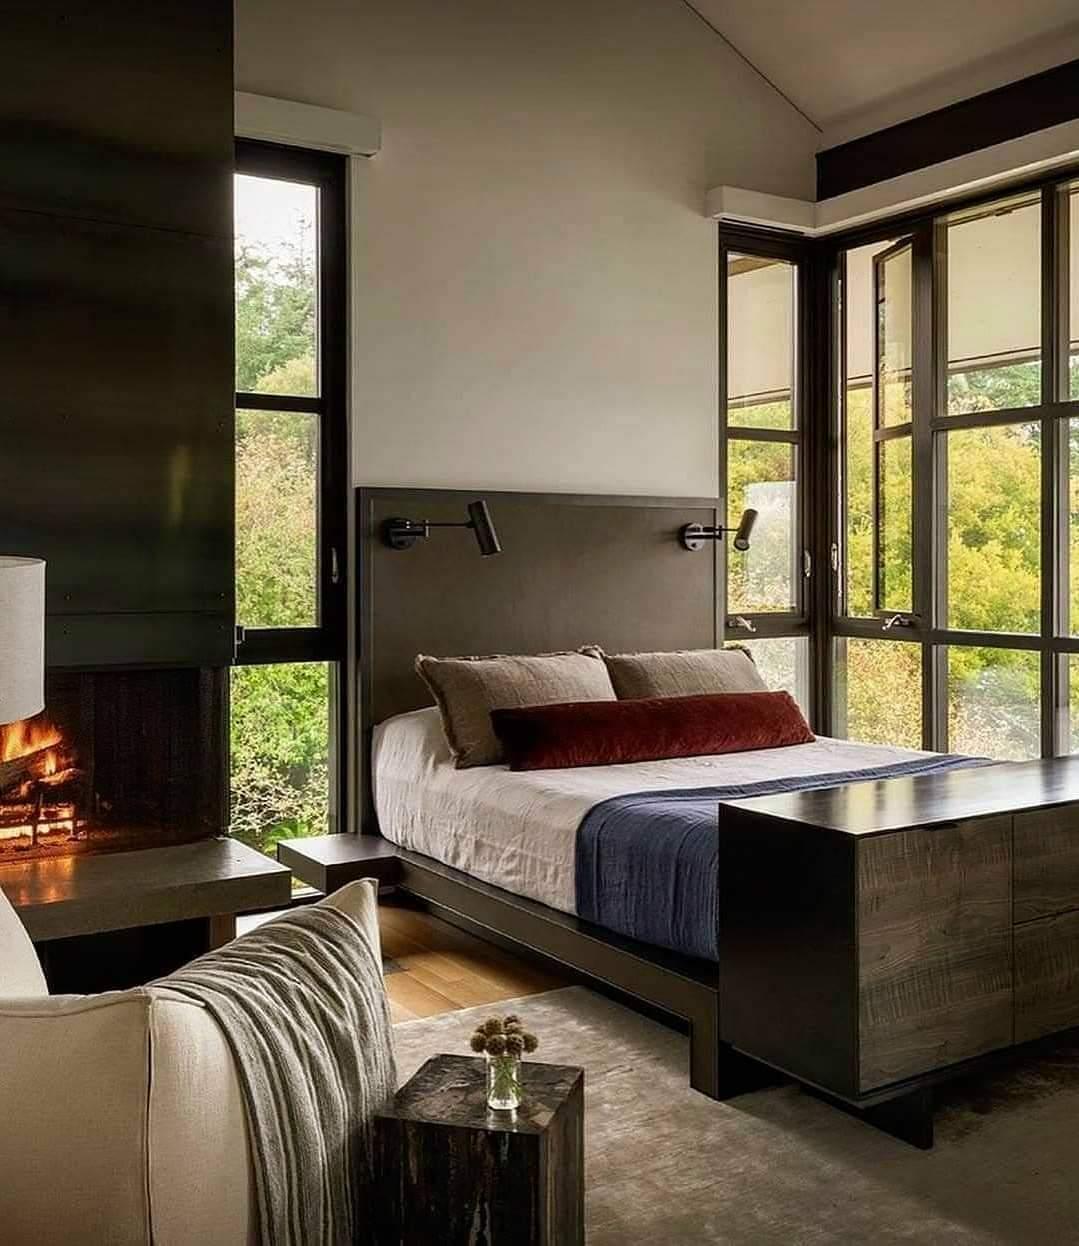 Stunning Bedroom - Source: Olson Kundig